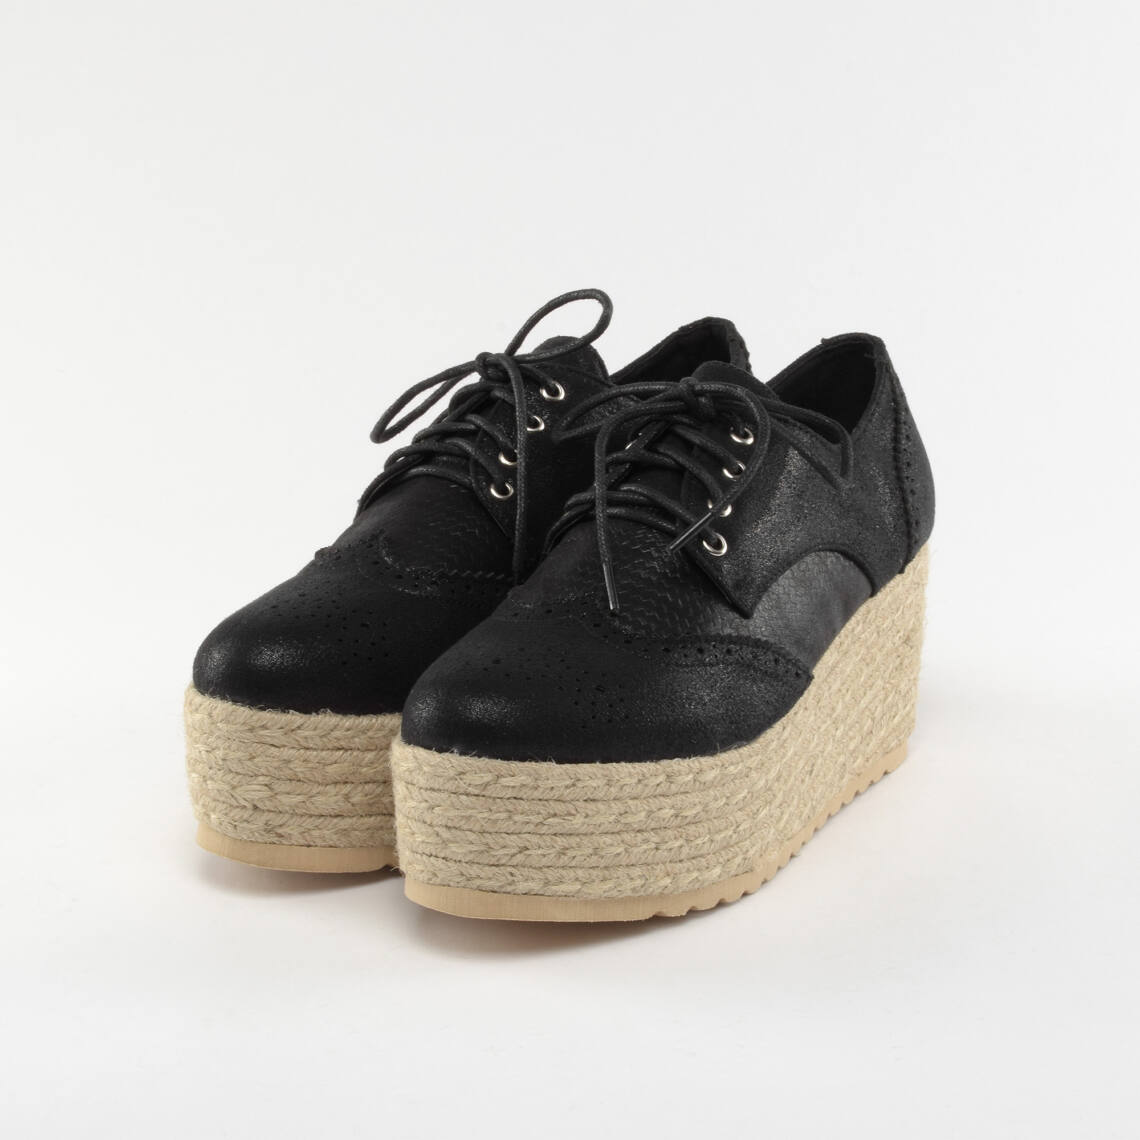 bd5070349301 Small Swan Női Magas talpú Fekete színű - MAGAS TALPÚ - Női cipő ...